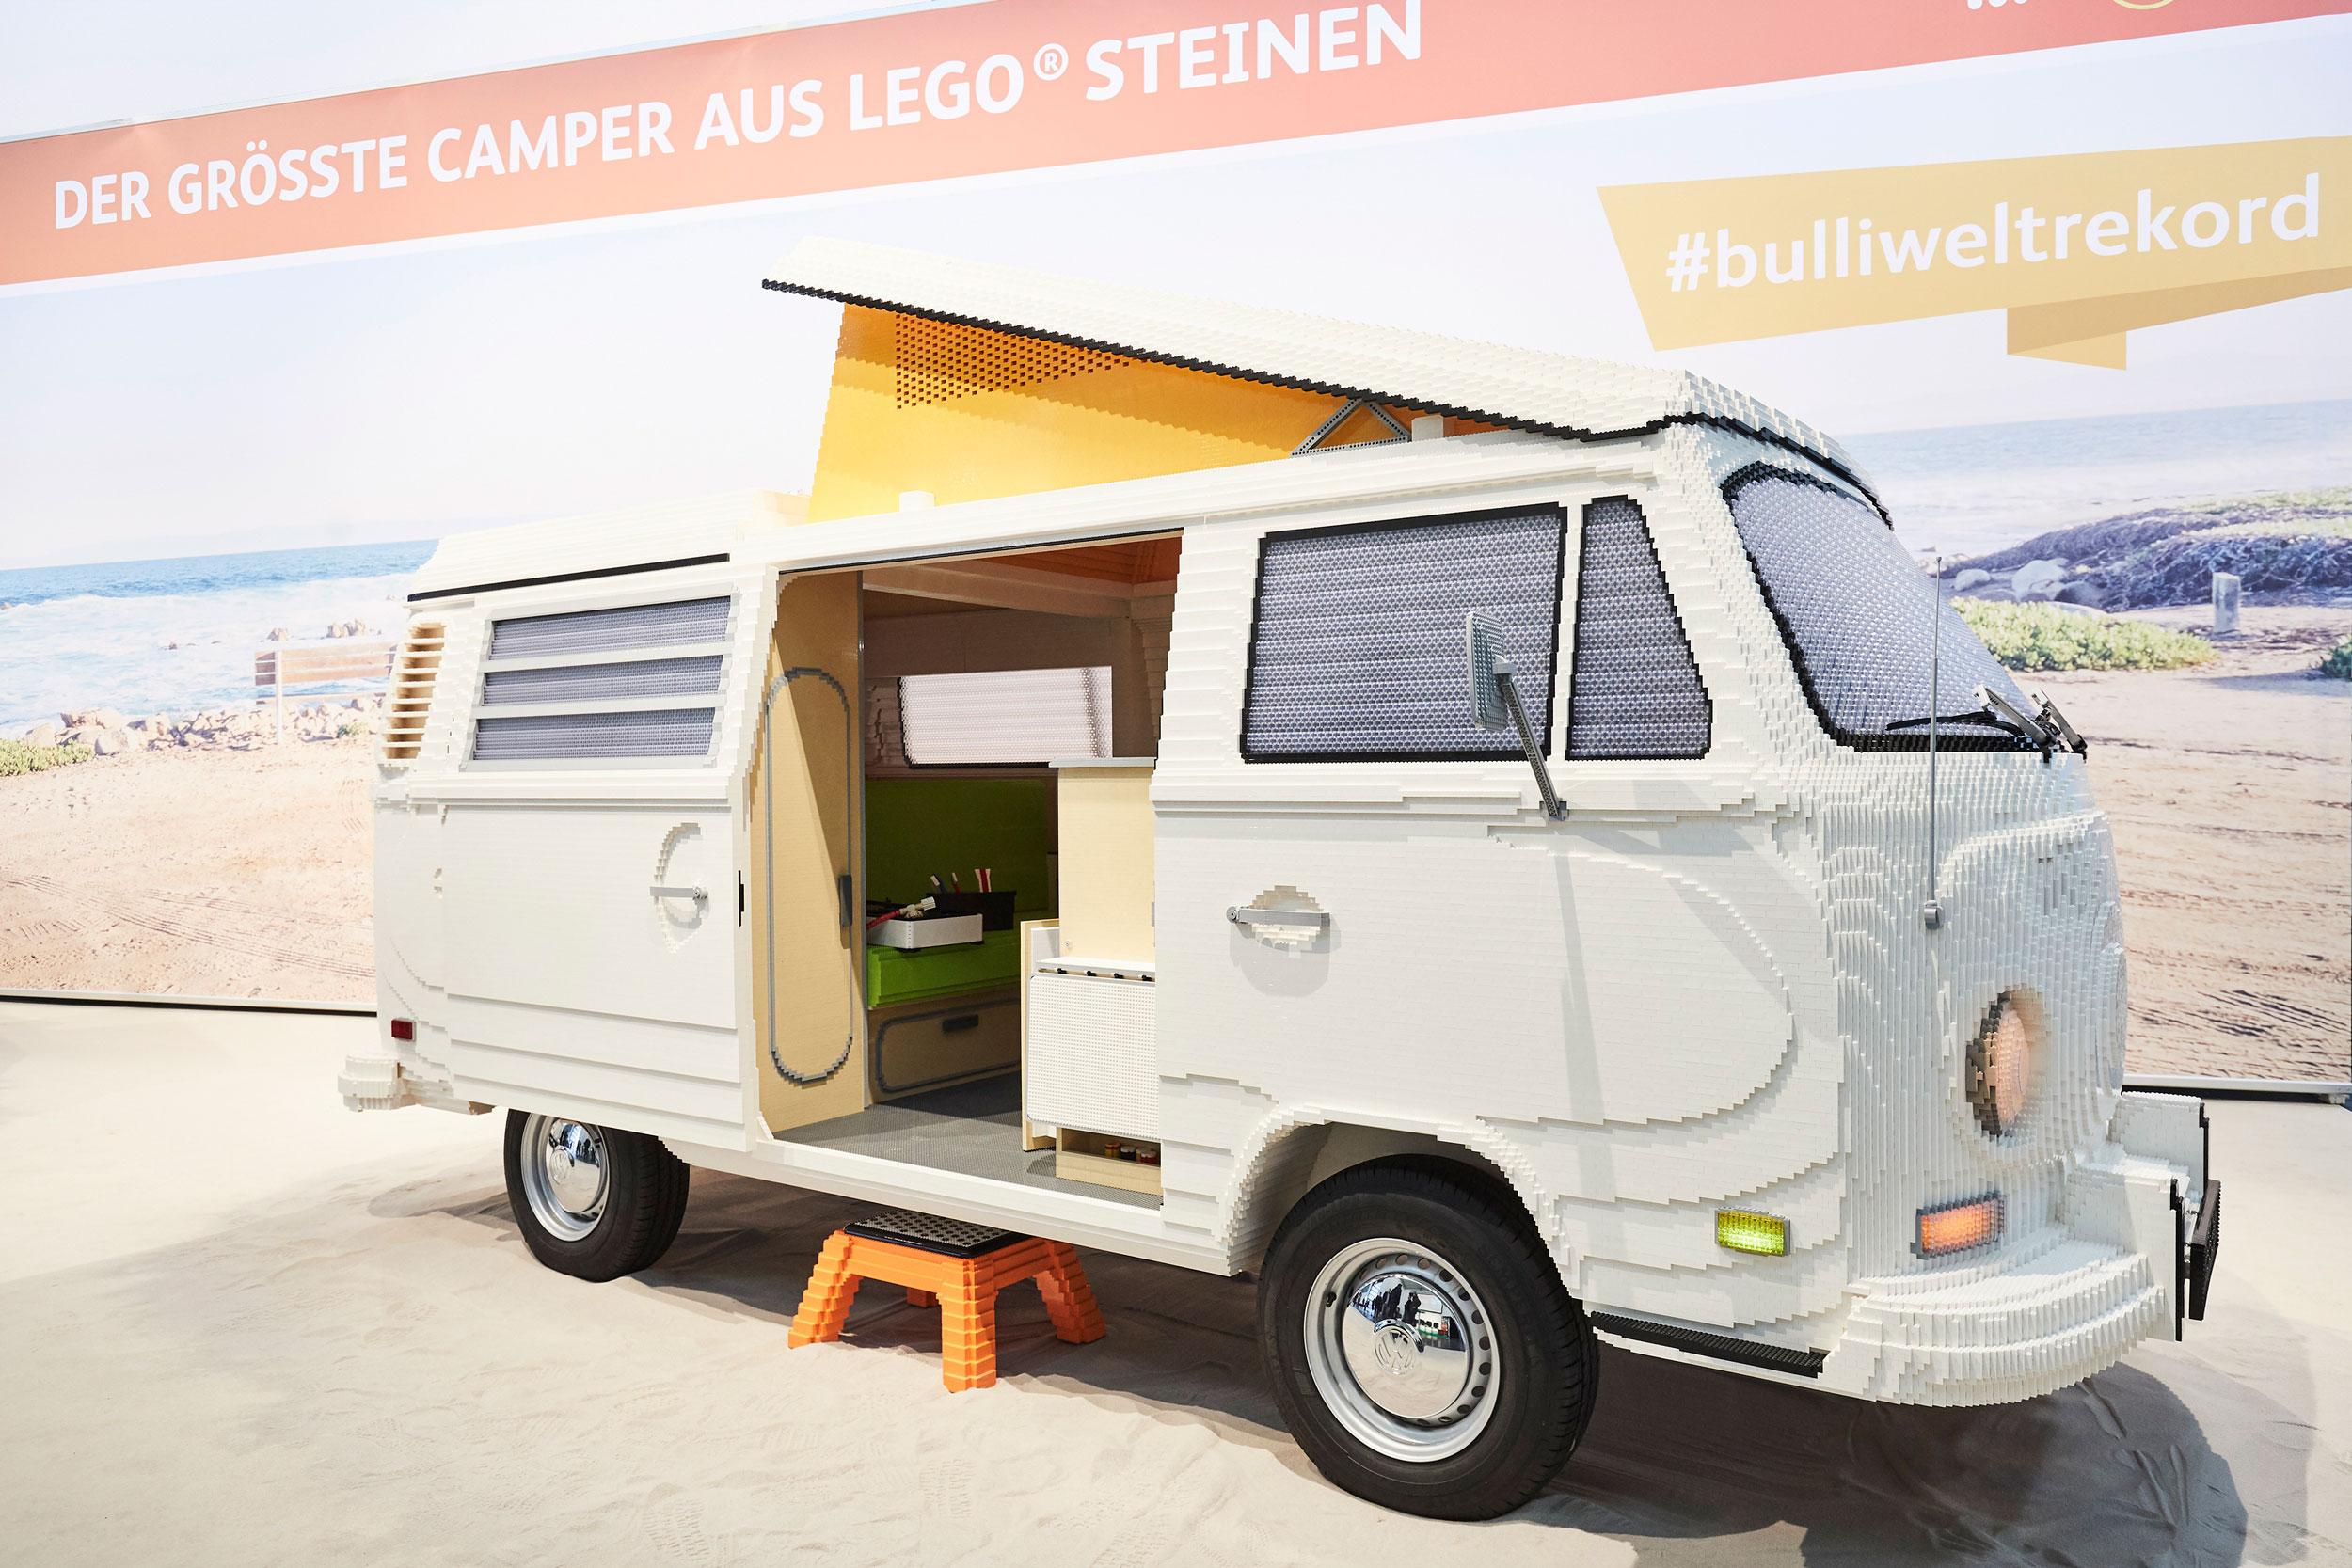 Volkswagen Type 2 created from 400,000 LEGO bricks